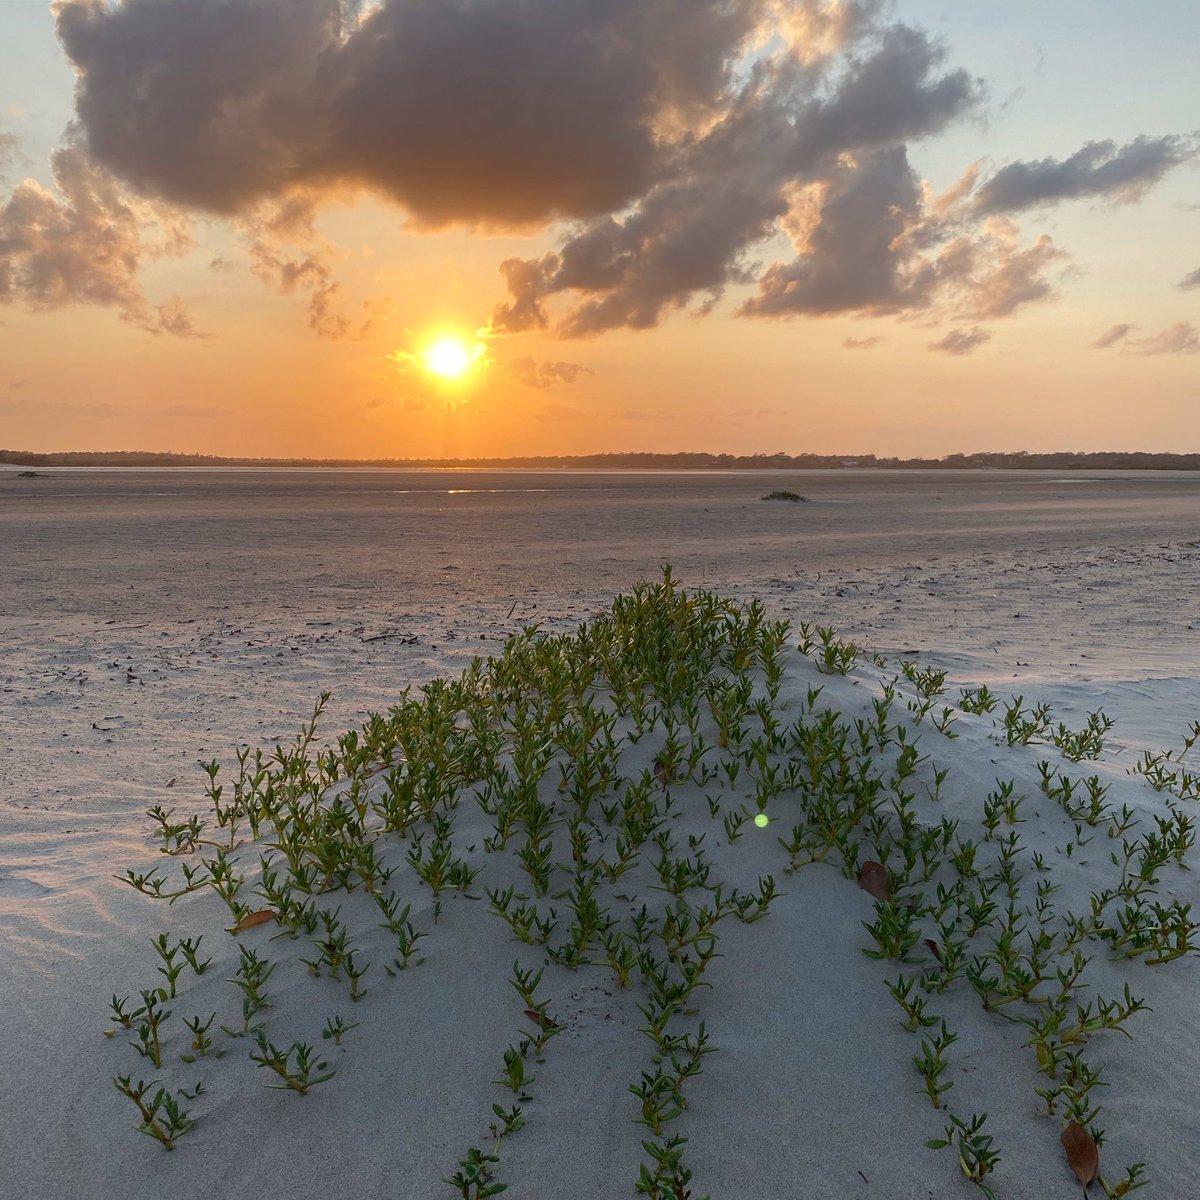 Sunset at Elliot Heads Beach. Photo by Cameron Robinson #InspireEvolve #InspireEvolve.com #Motivation #InspirationalQuotesAndSayings #InspirationalQuotes #inspirationalquotesaboutlife  http:// instagram.com/p/B7QceFvFuF-/    …<br>http://pic.twitter.com/CNFmCW6Hod